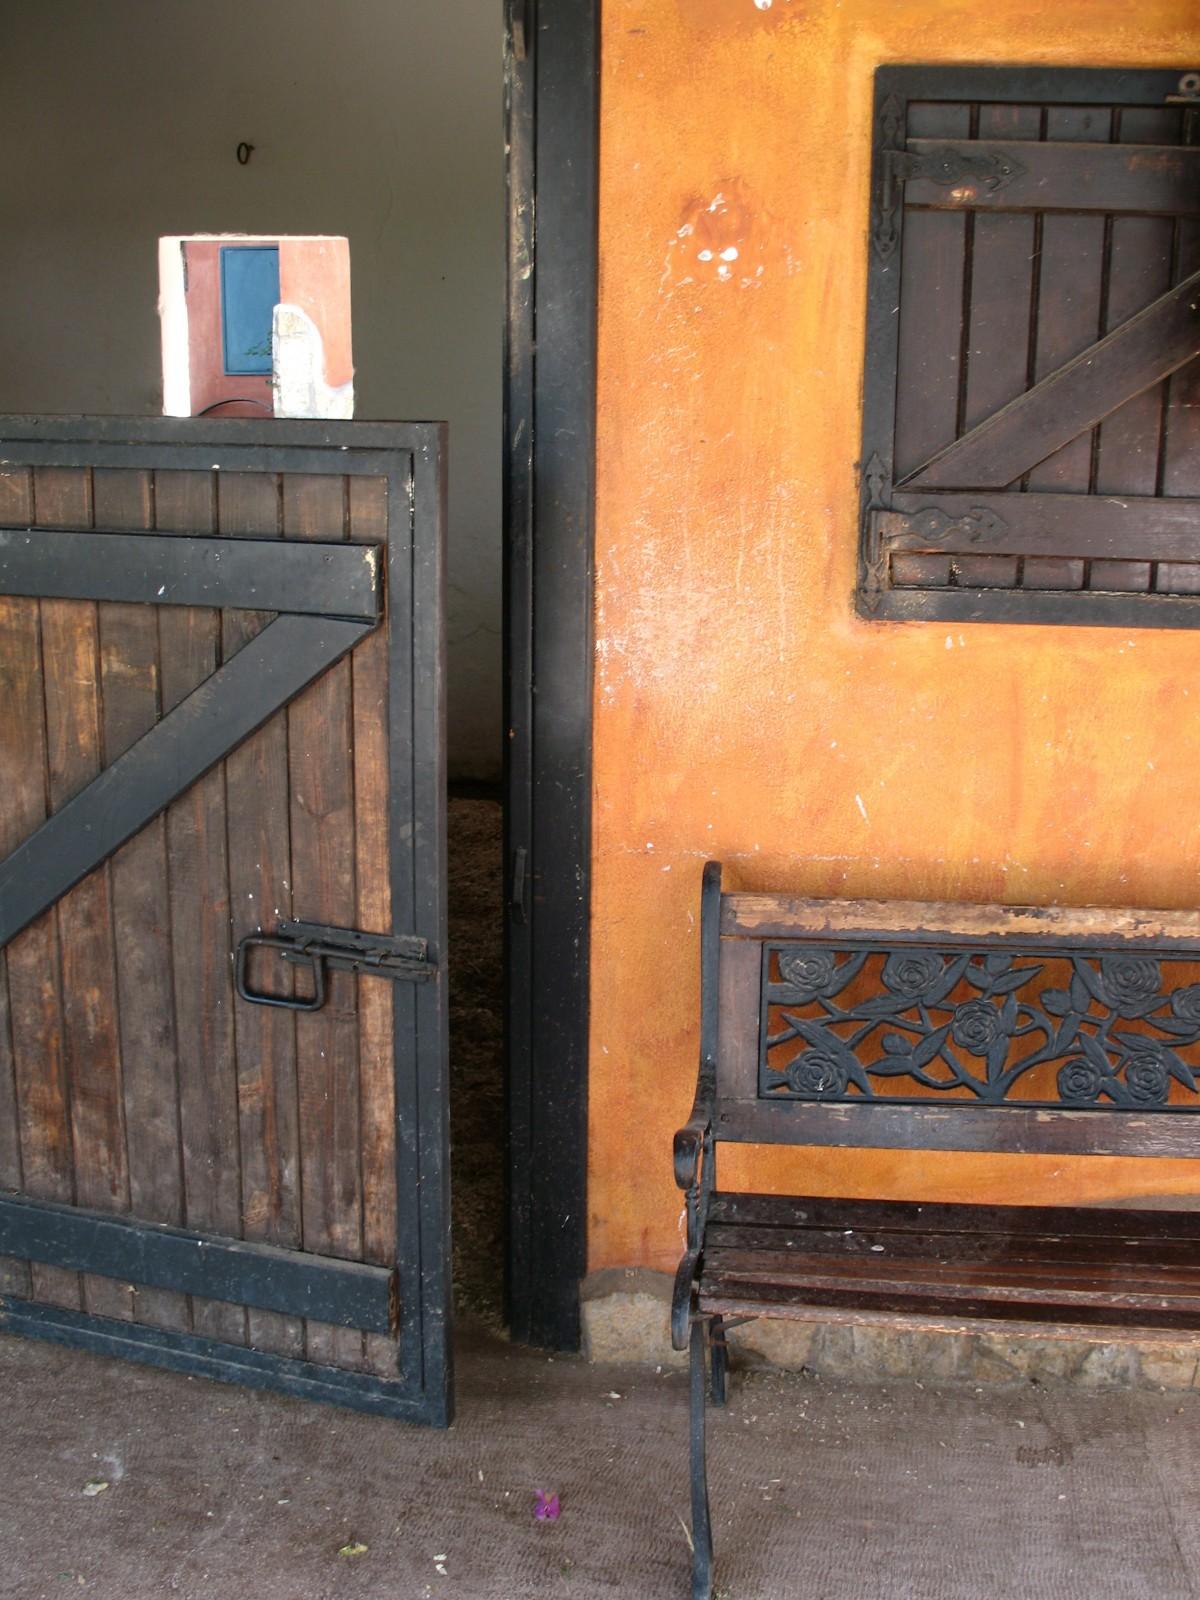 Fotos Gratis Madera Granja Casa Ventana Pared Pintar Arte  # Jutlandia Muebles